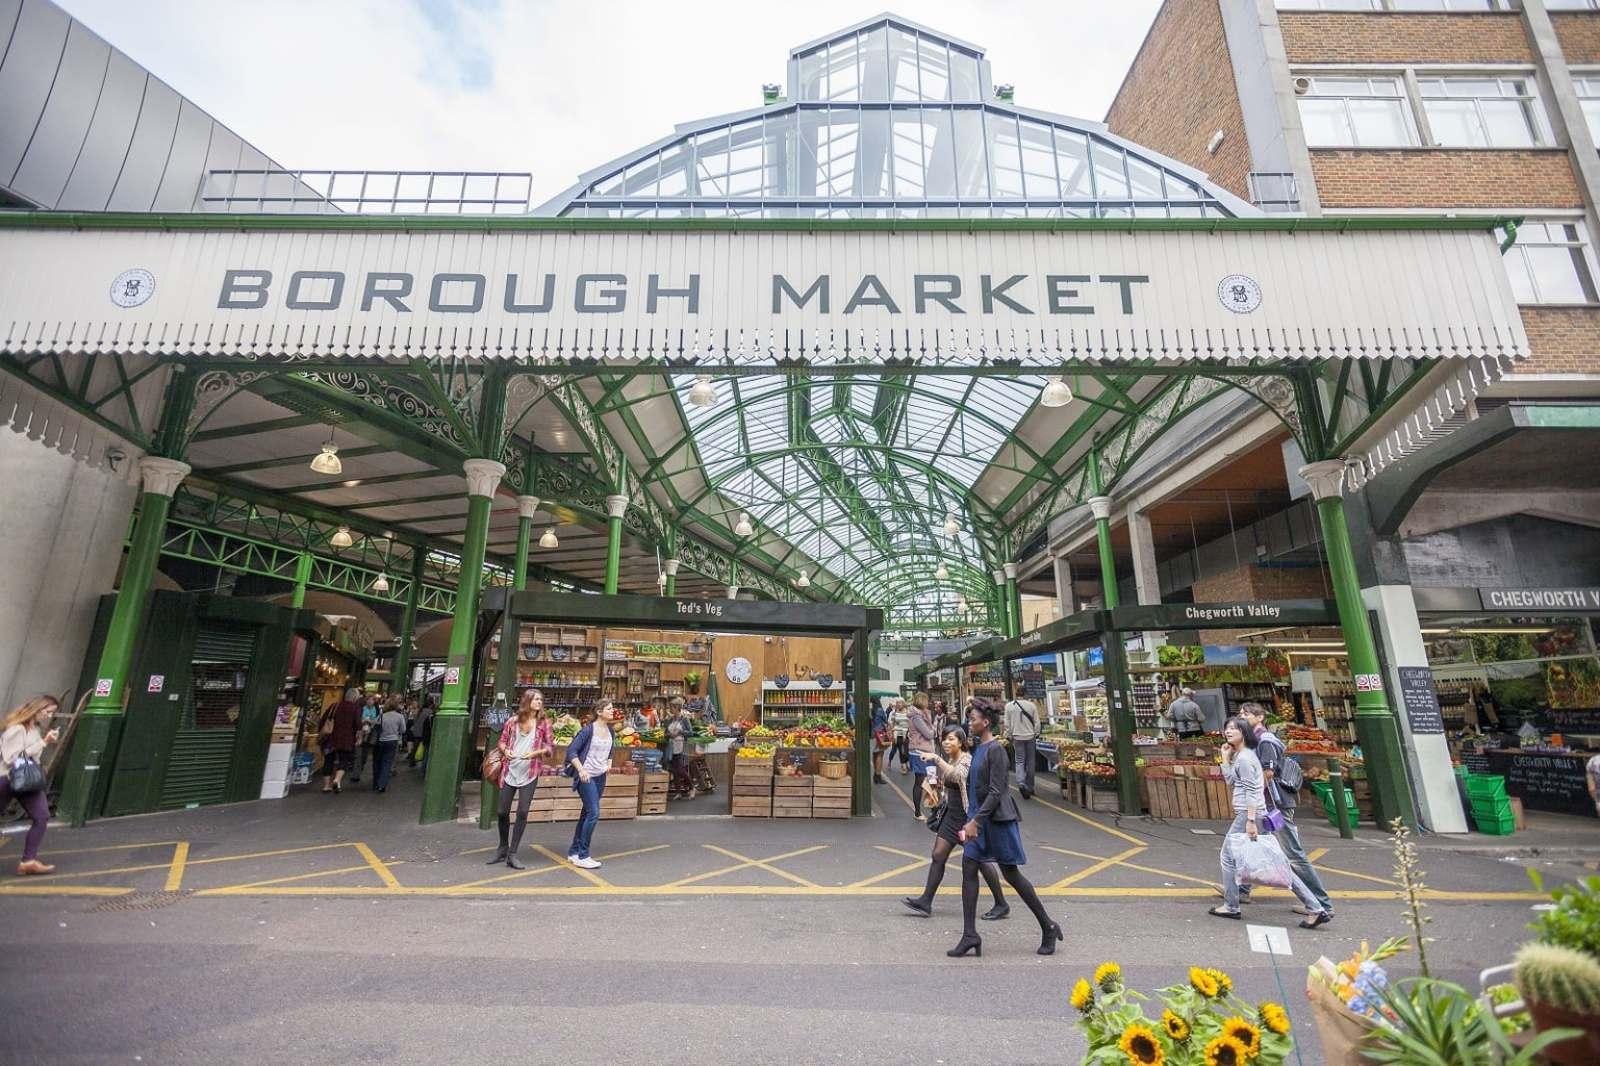 Entrance to Borough Market in London